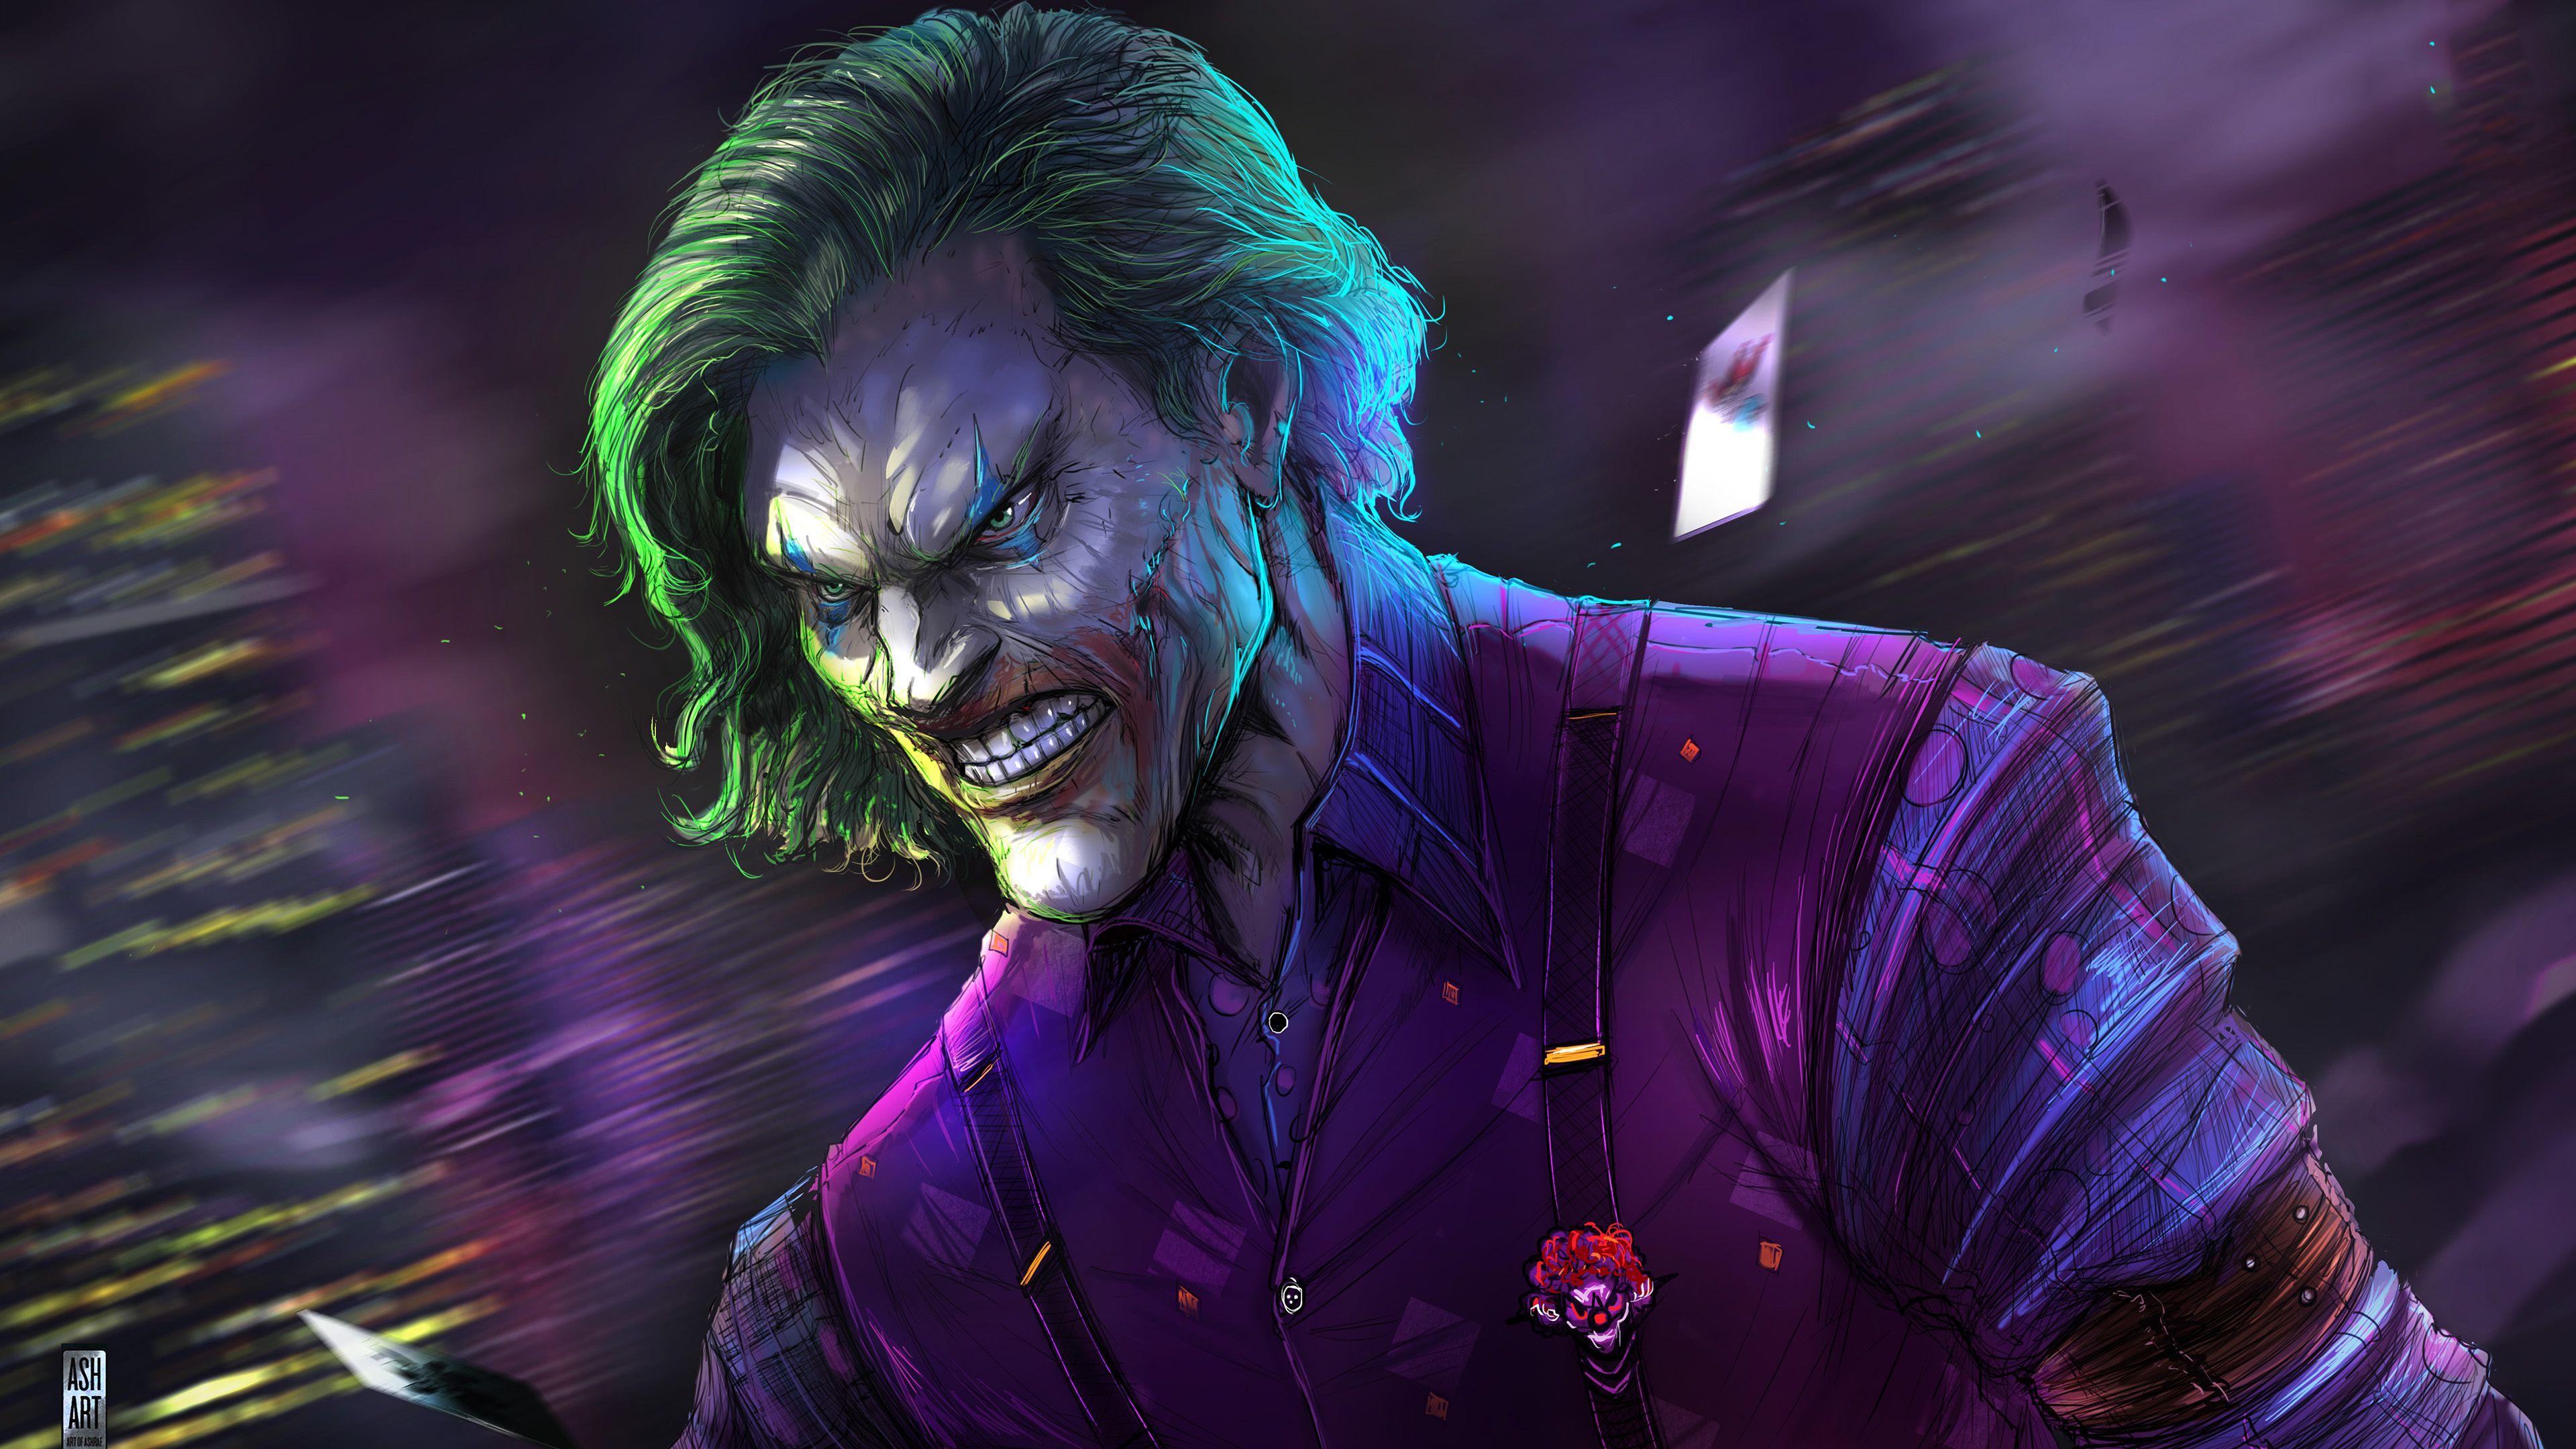 Joker Artwork 4k 2019 Superheroes Wallpapers Joker Wallpapers Hd Wallpapers Digital Art Wallpapers Beha Joker Wallpapers Joker Hd Wallpaper Joker Images Hd